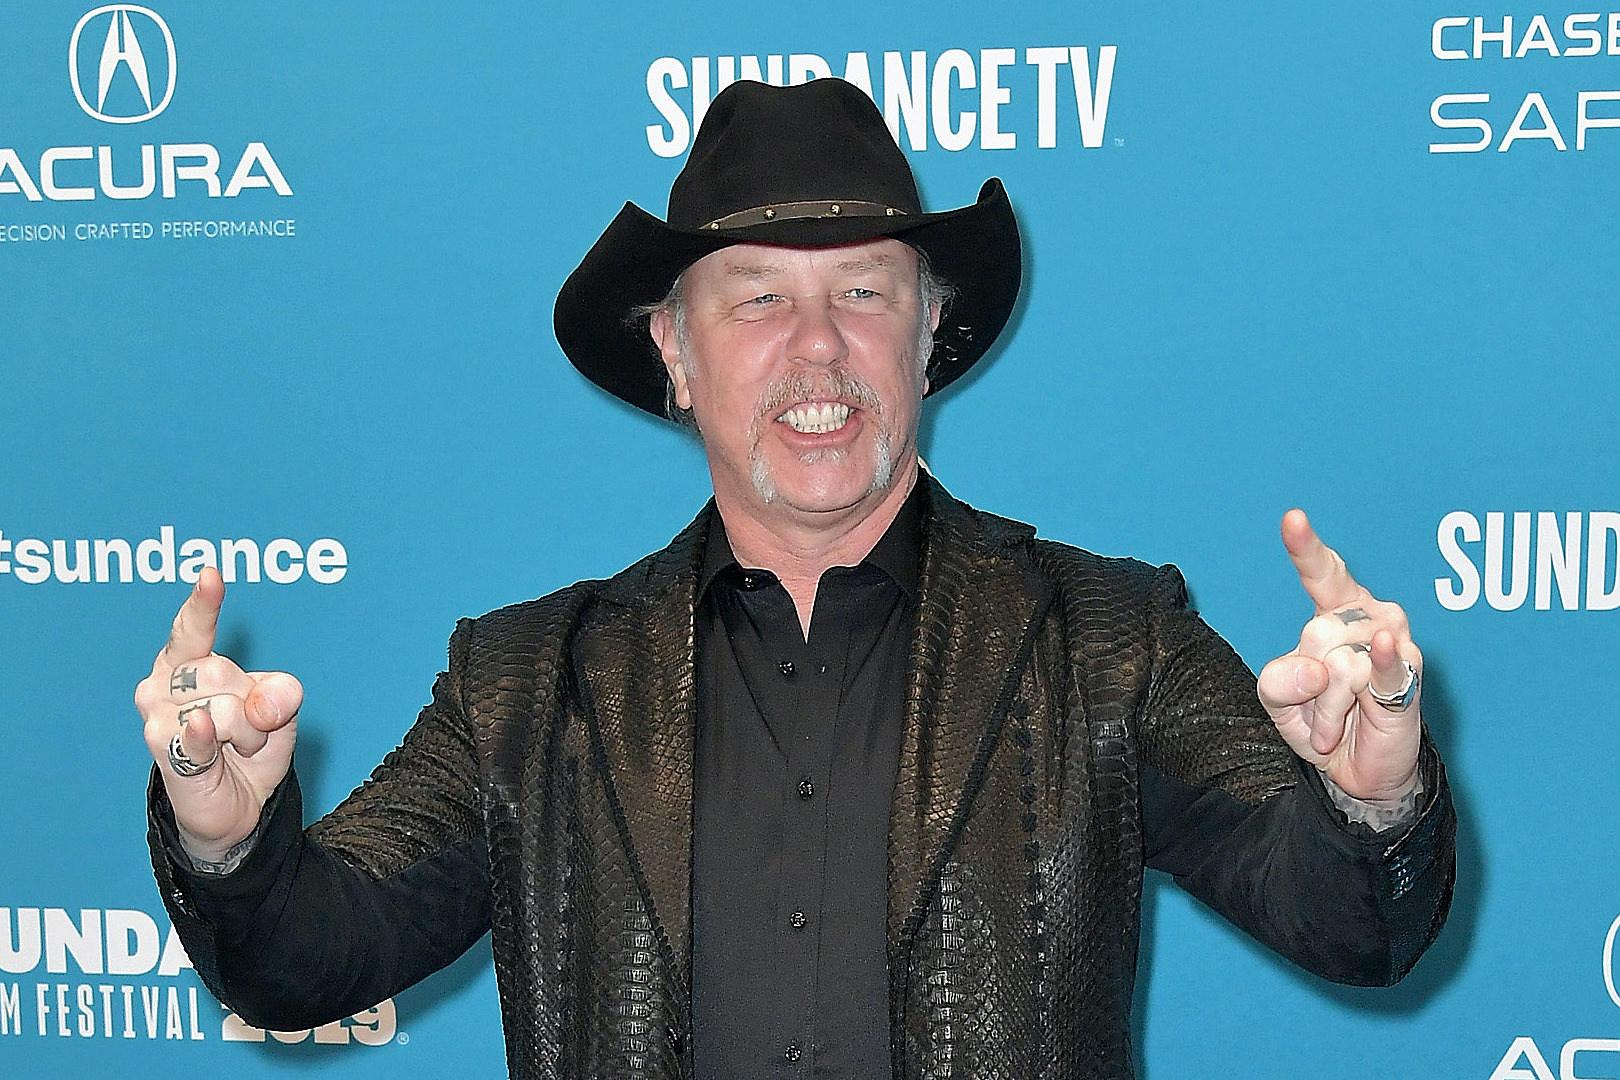 Metallica's James Hetfield Sells Land in Arizona for $1.2 Million